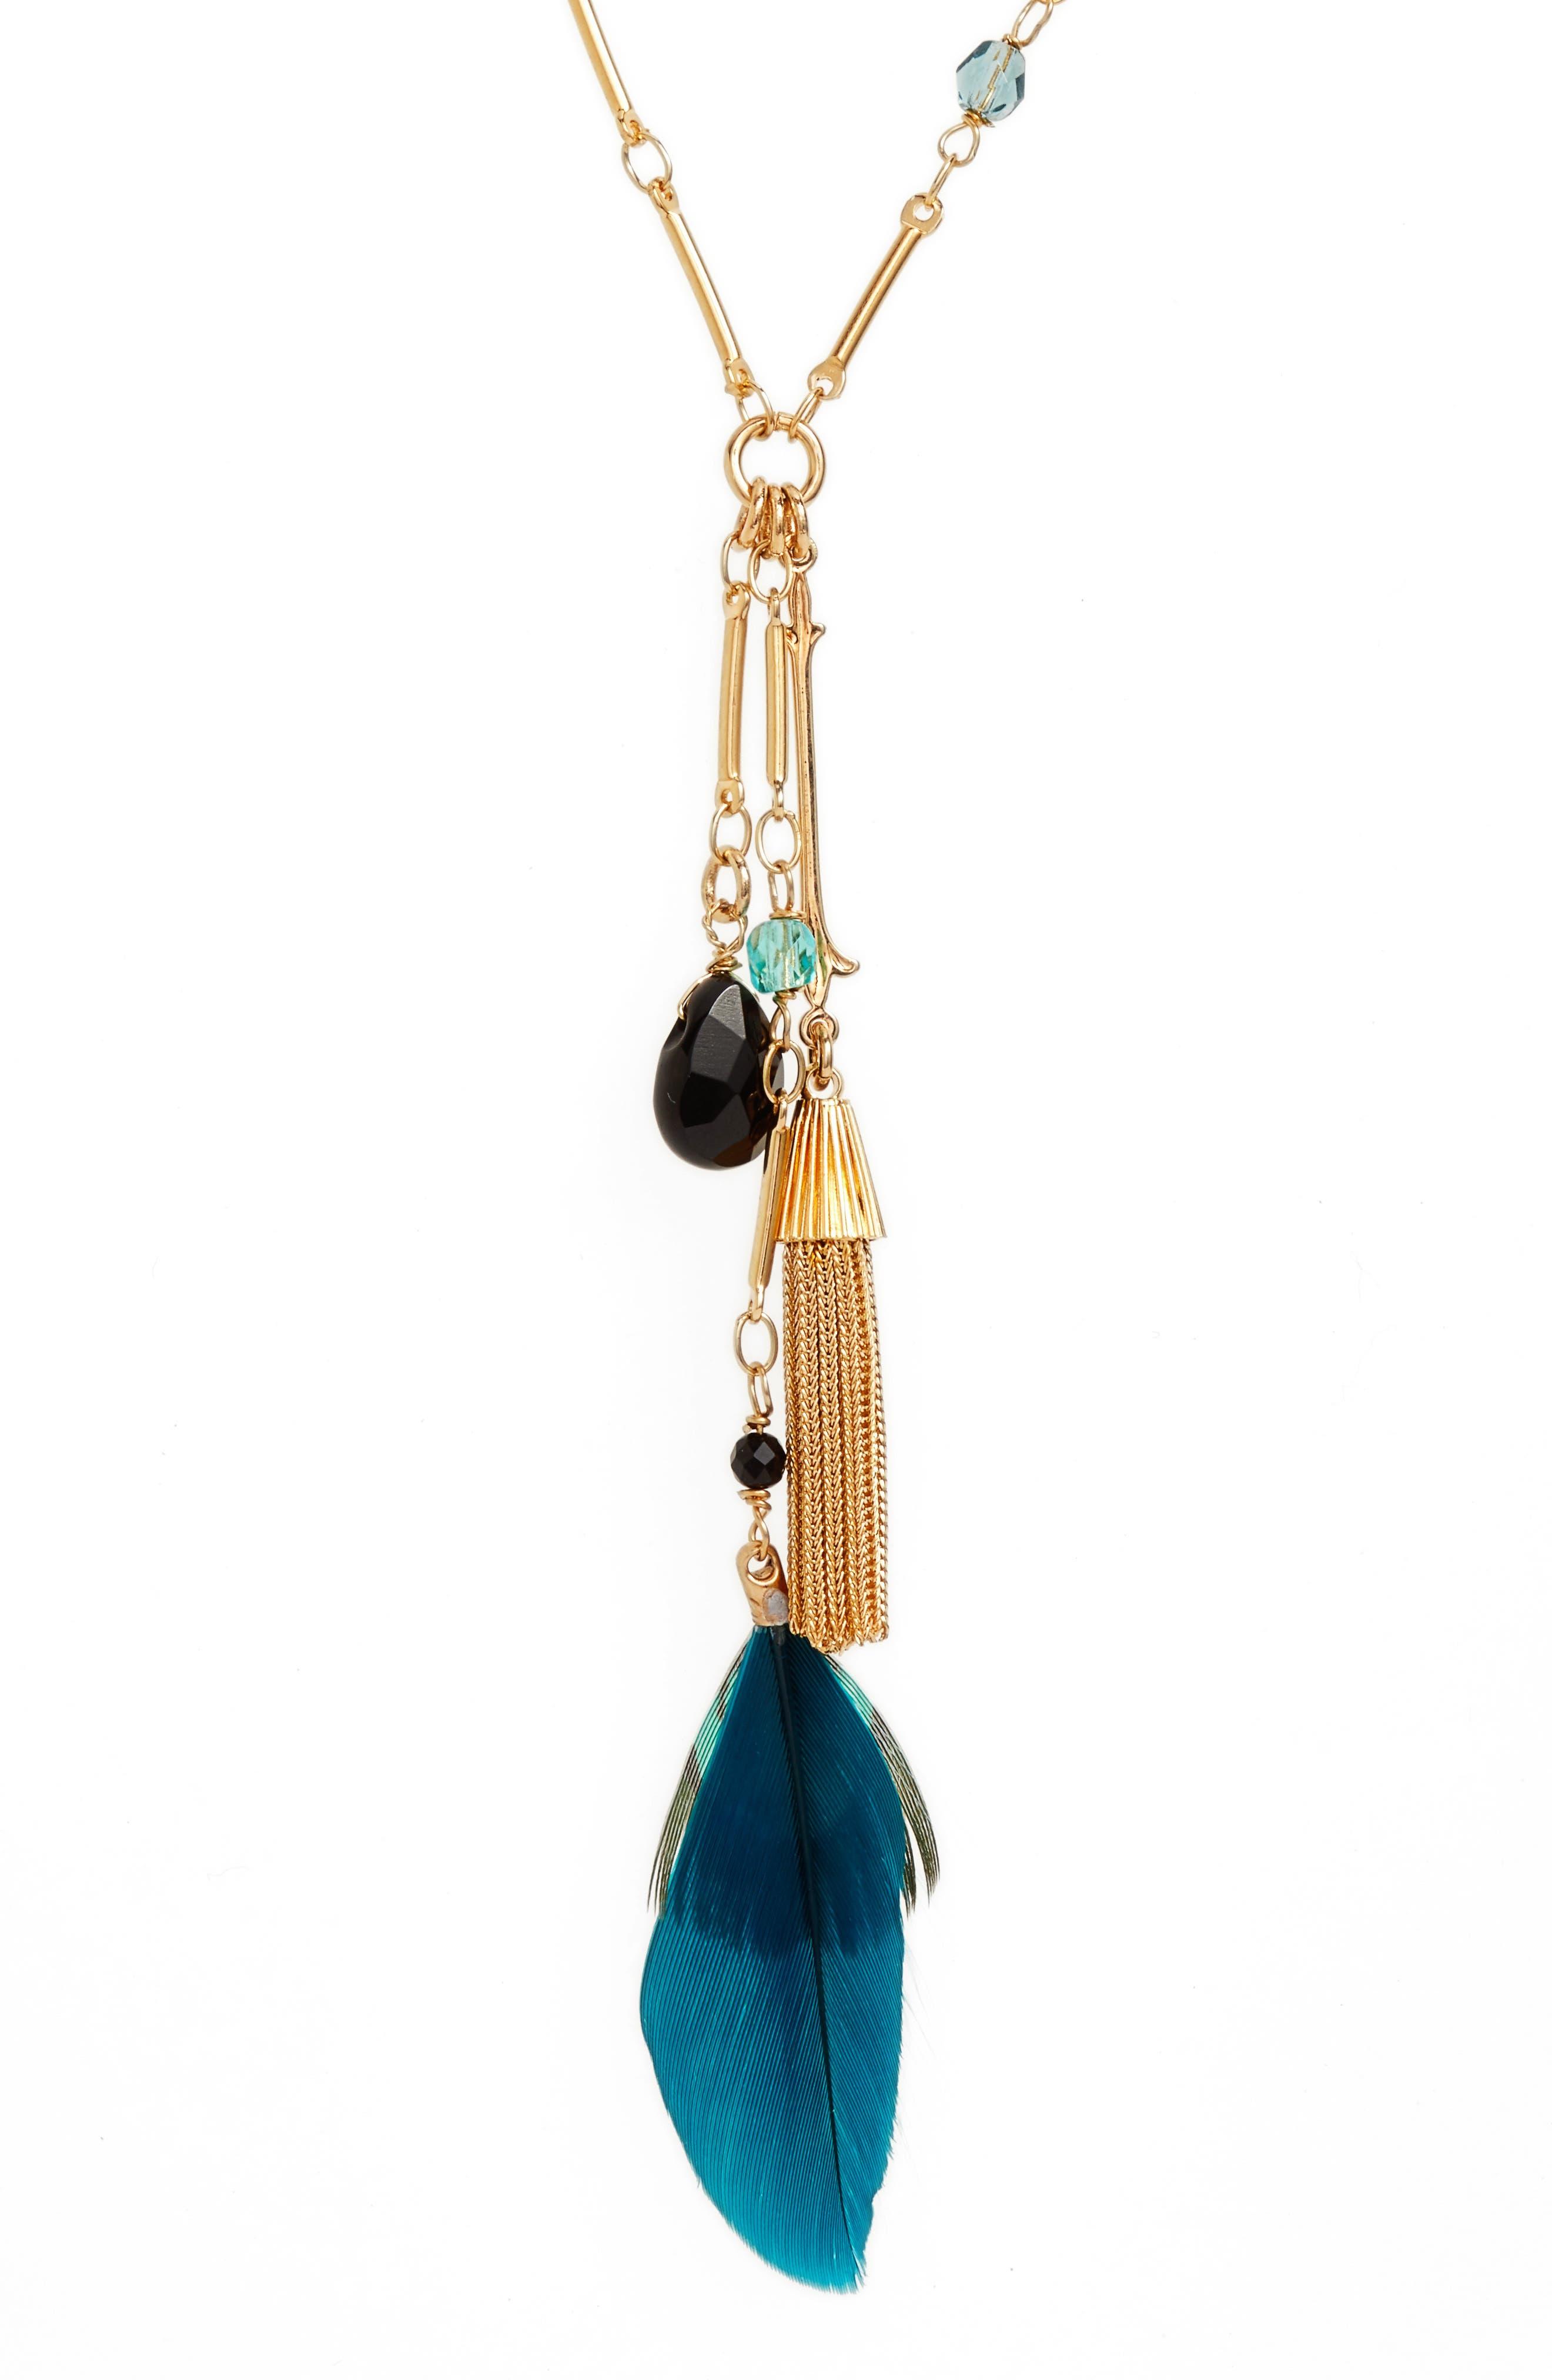 California Pendant Necklace,                             Alternate thumbnail 2, color,                             Blue Teal/ Gold